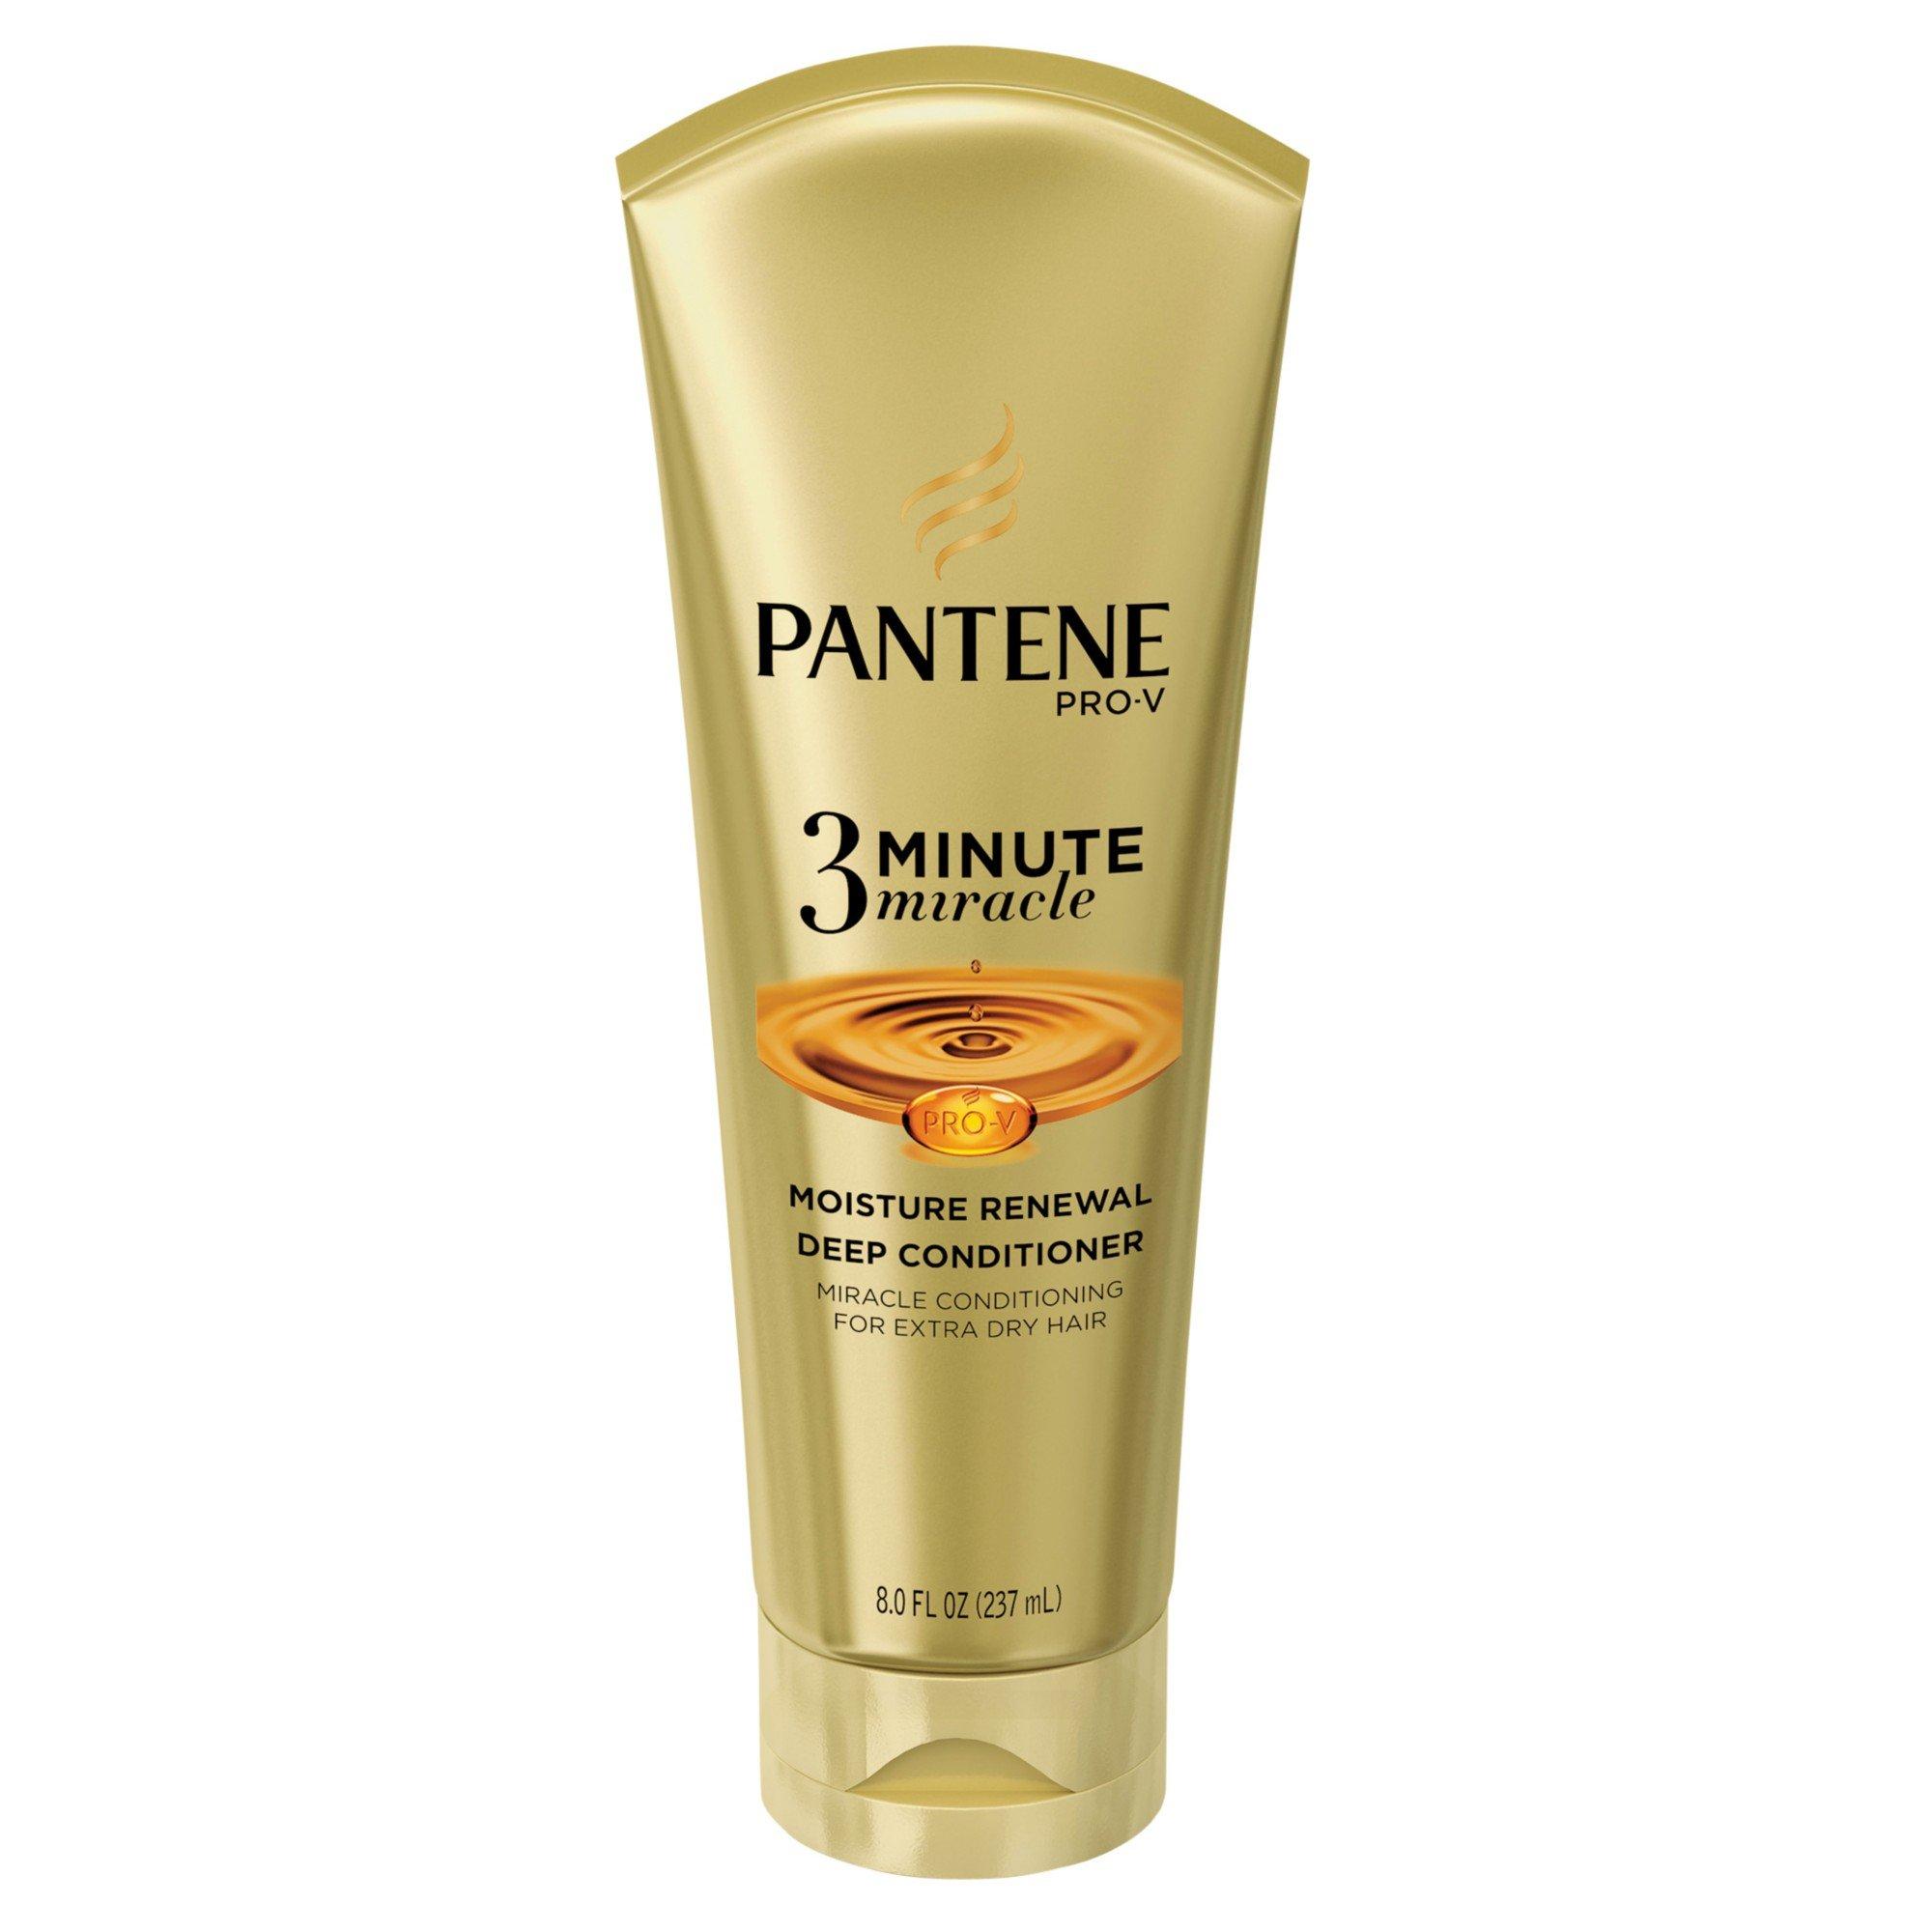 Pantene Pro‑V 3 Minute Miracle Moisture Renewal Deep Conditioner 8 OZ (Pack of 4) + (Vitaminder Power Shaker Bottle, 20 oz Bottle) by Pantene (Image #1)